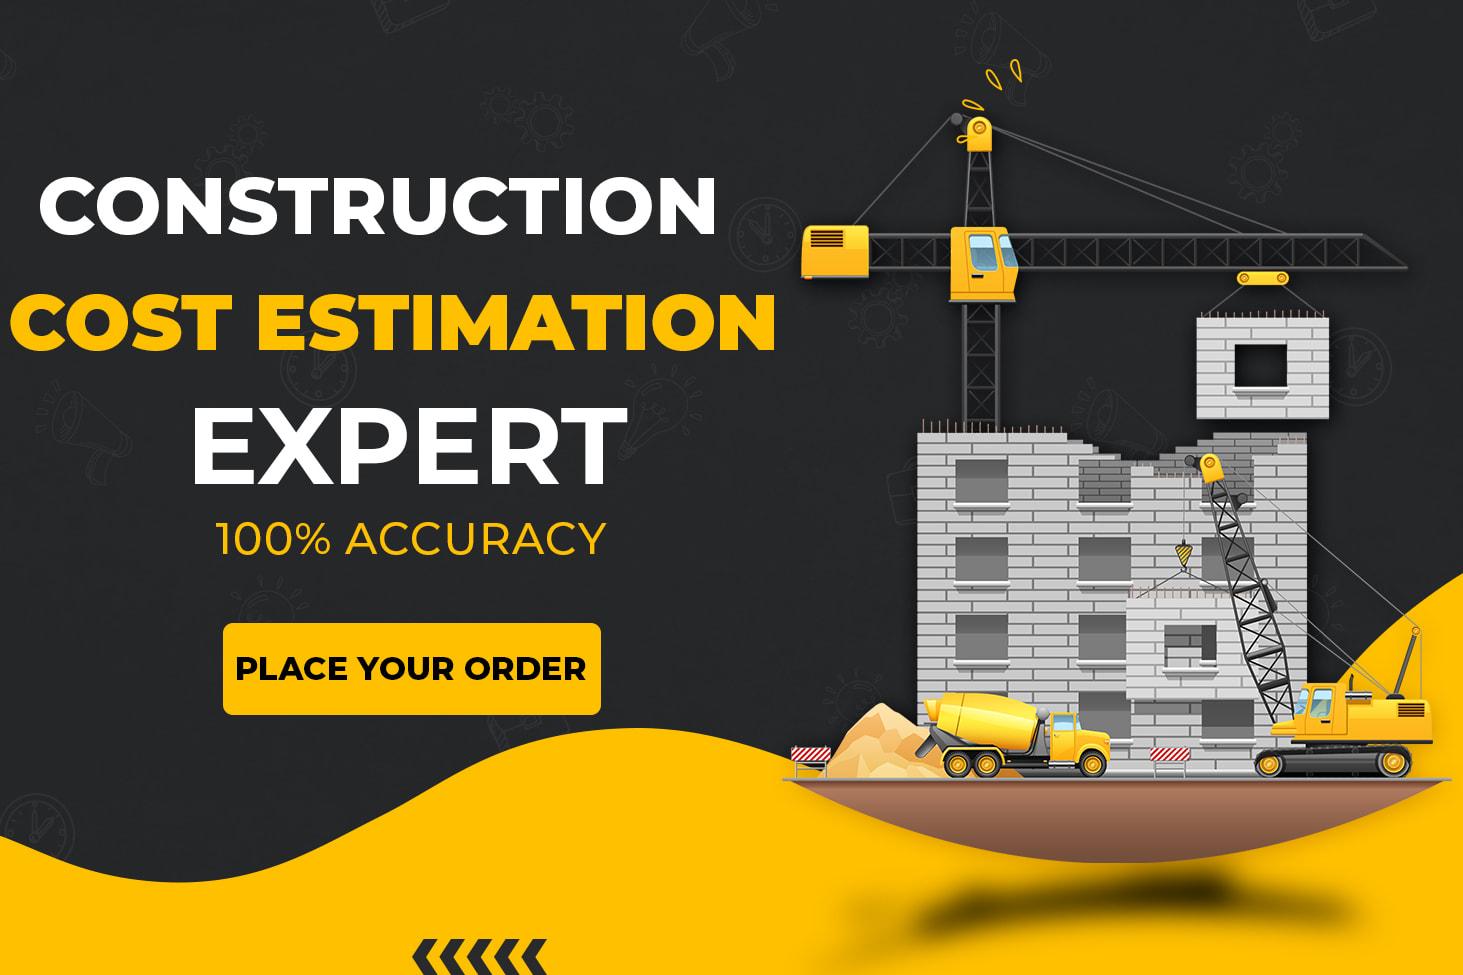 Construction Cost Estimation Freelancers for Hire - Guru